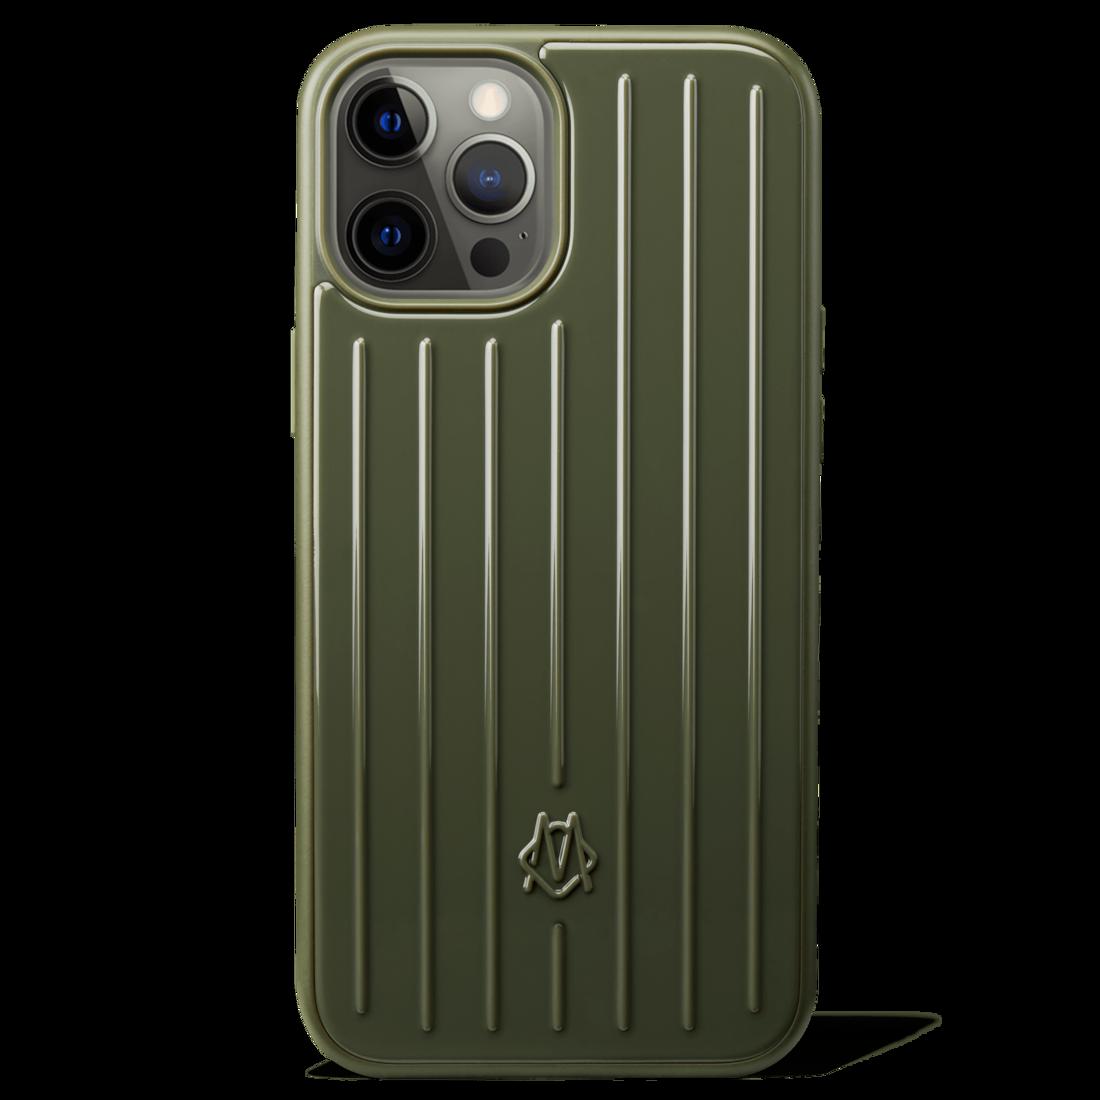 Accessoires Coque Vert Cactus pour iPhone 12 Pro Max